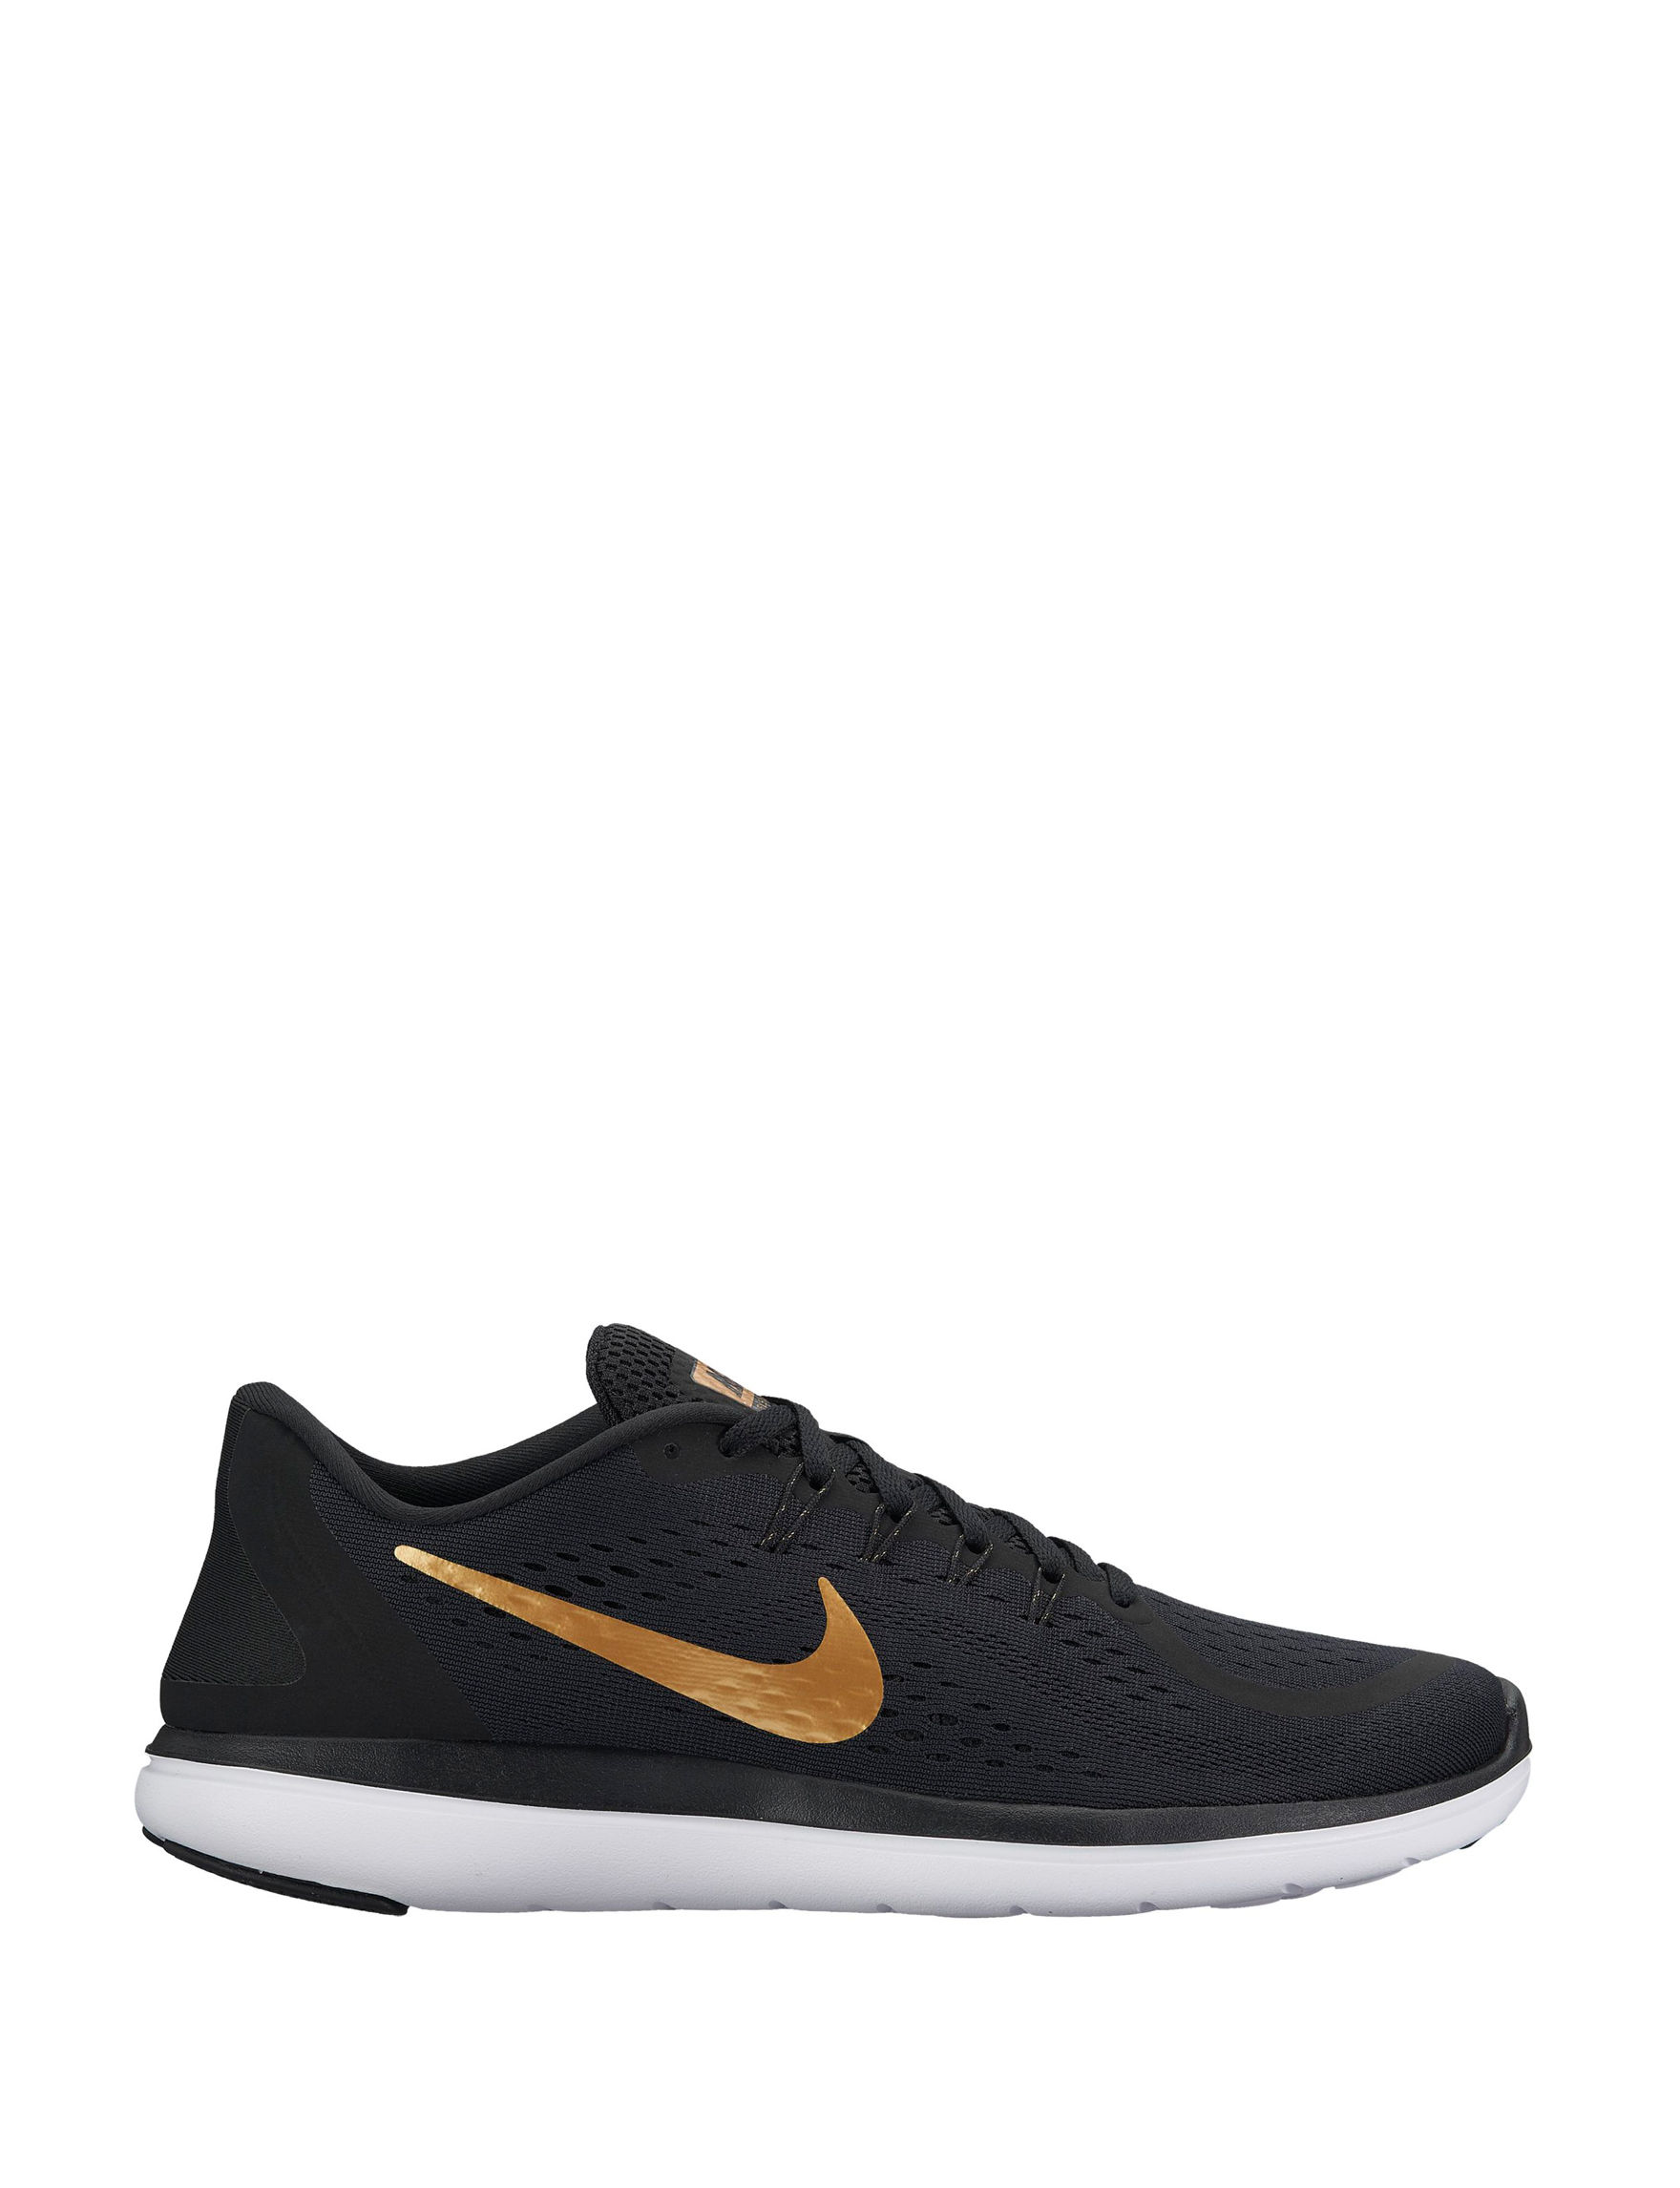 Nike Gold